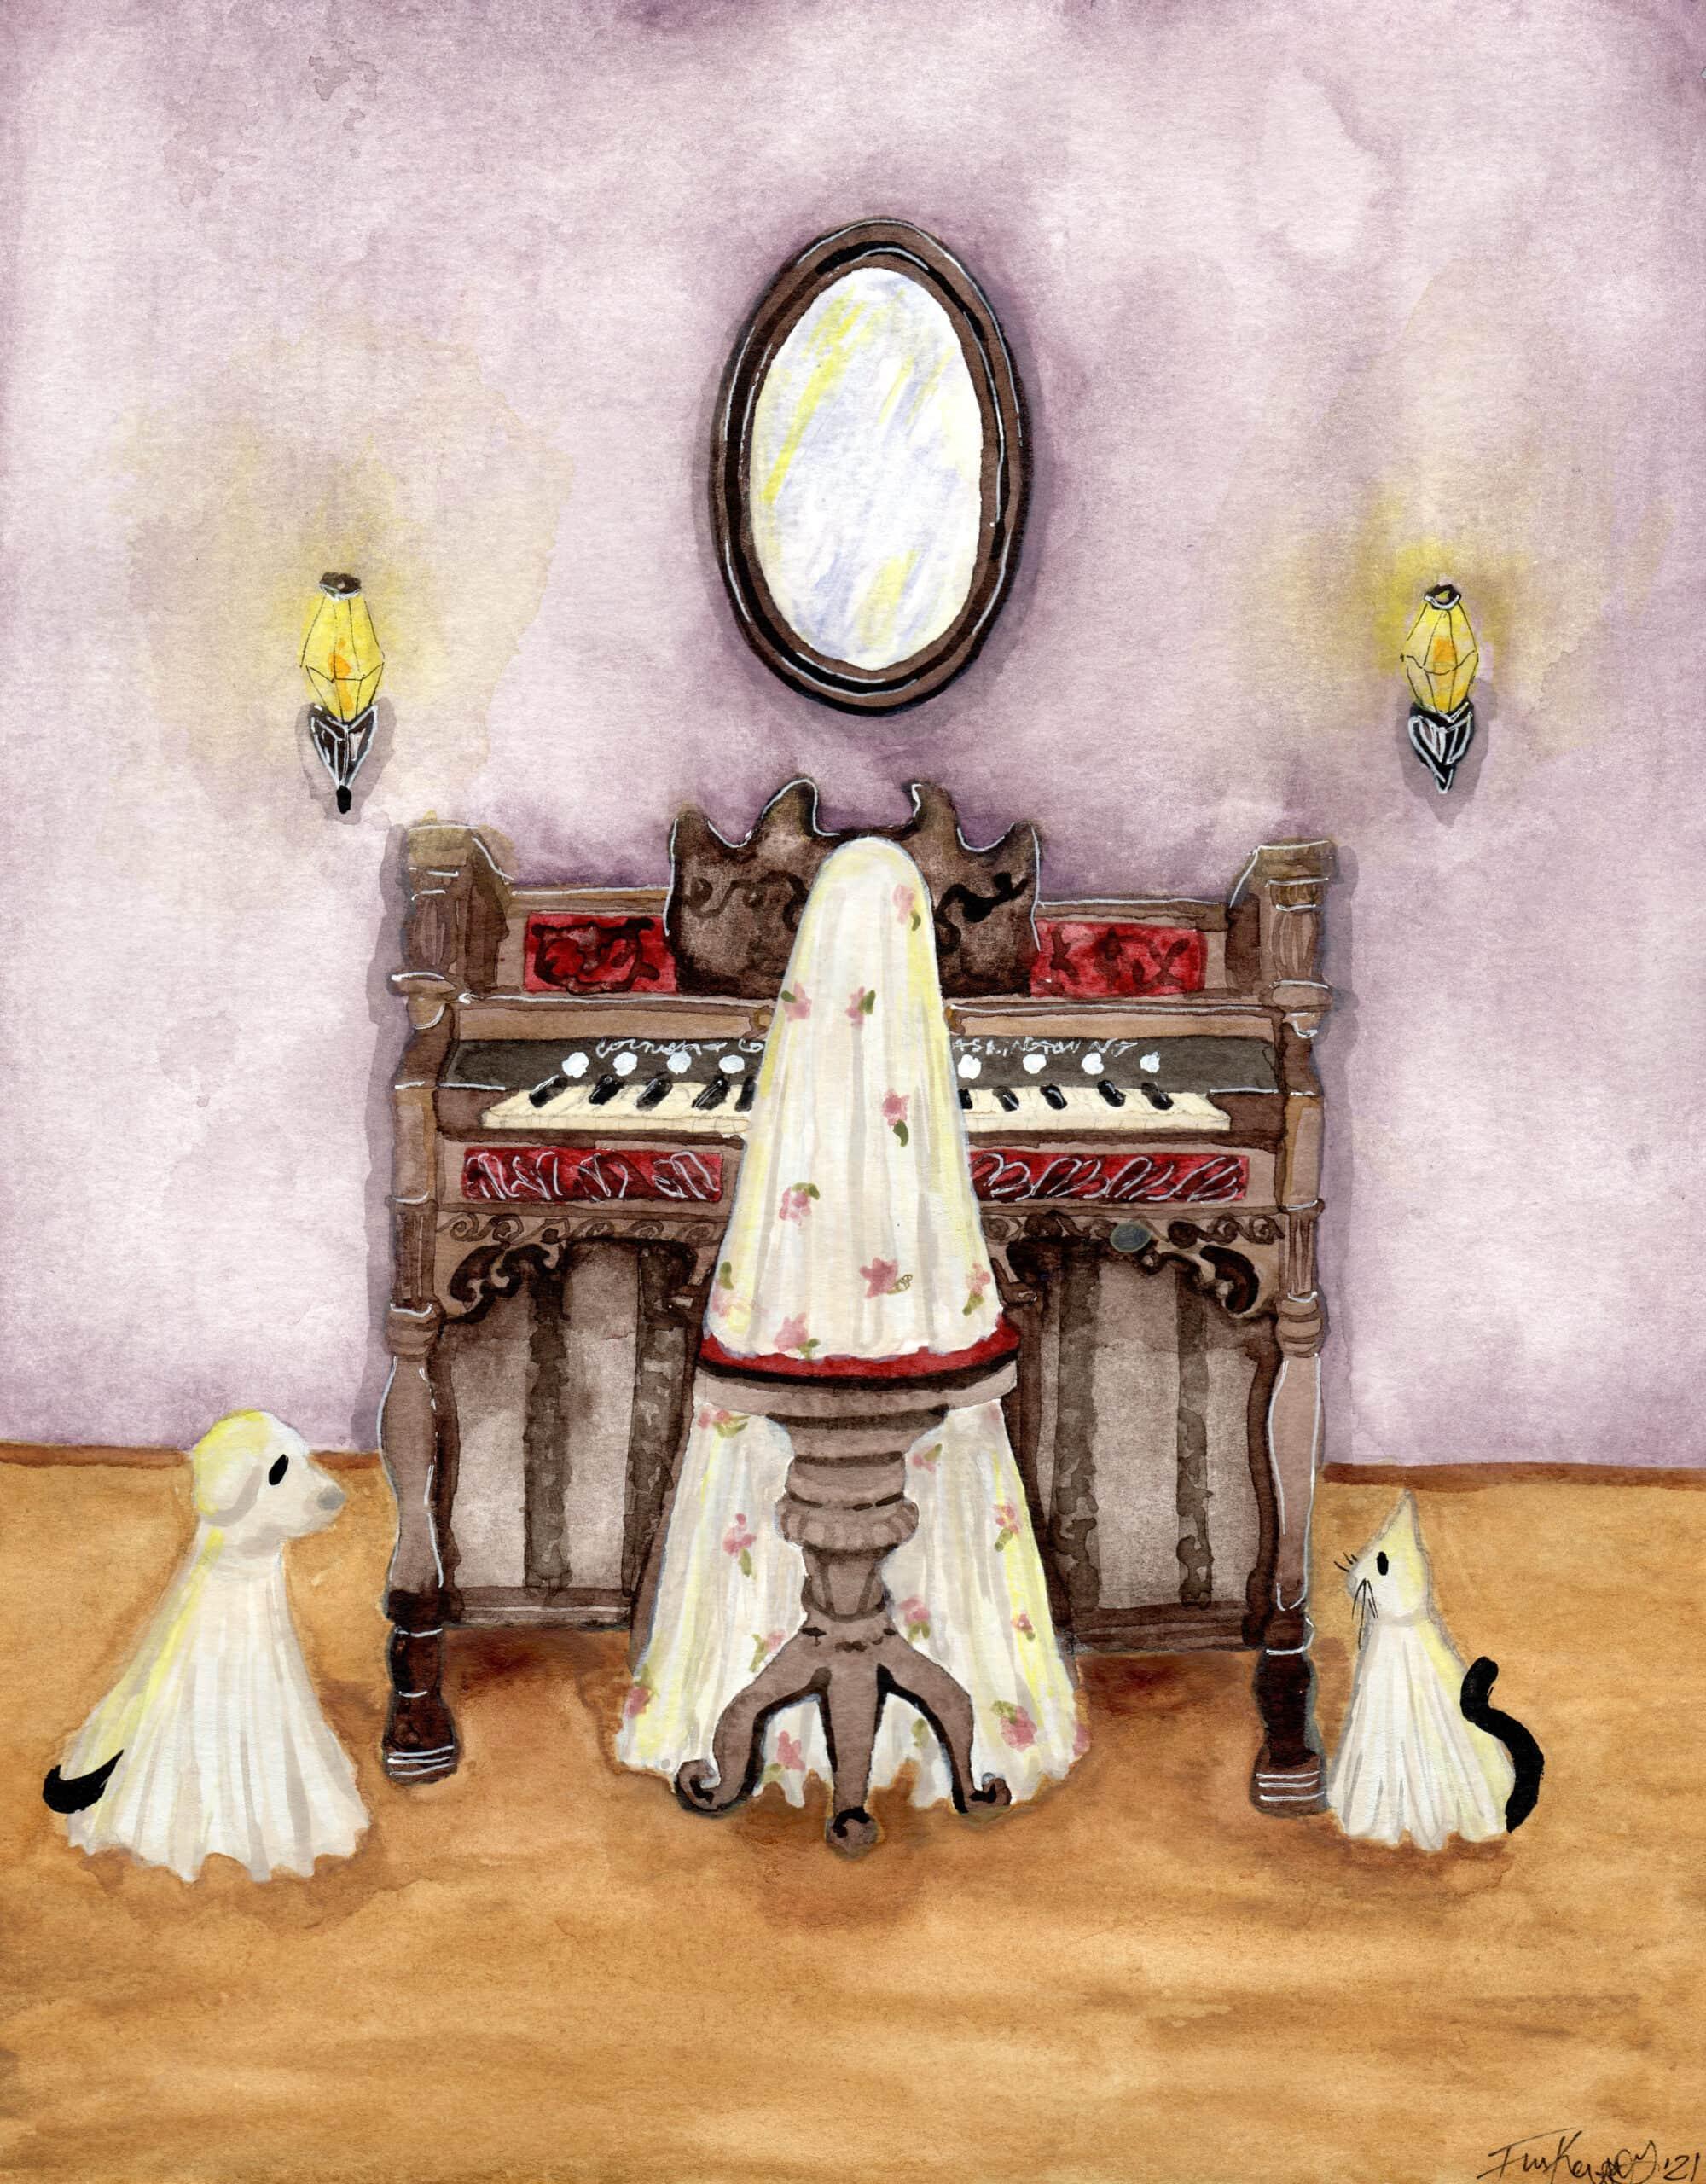 Haunted Organ